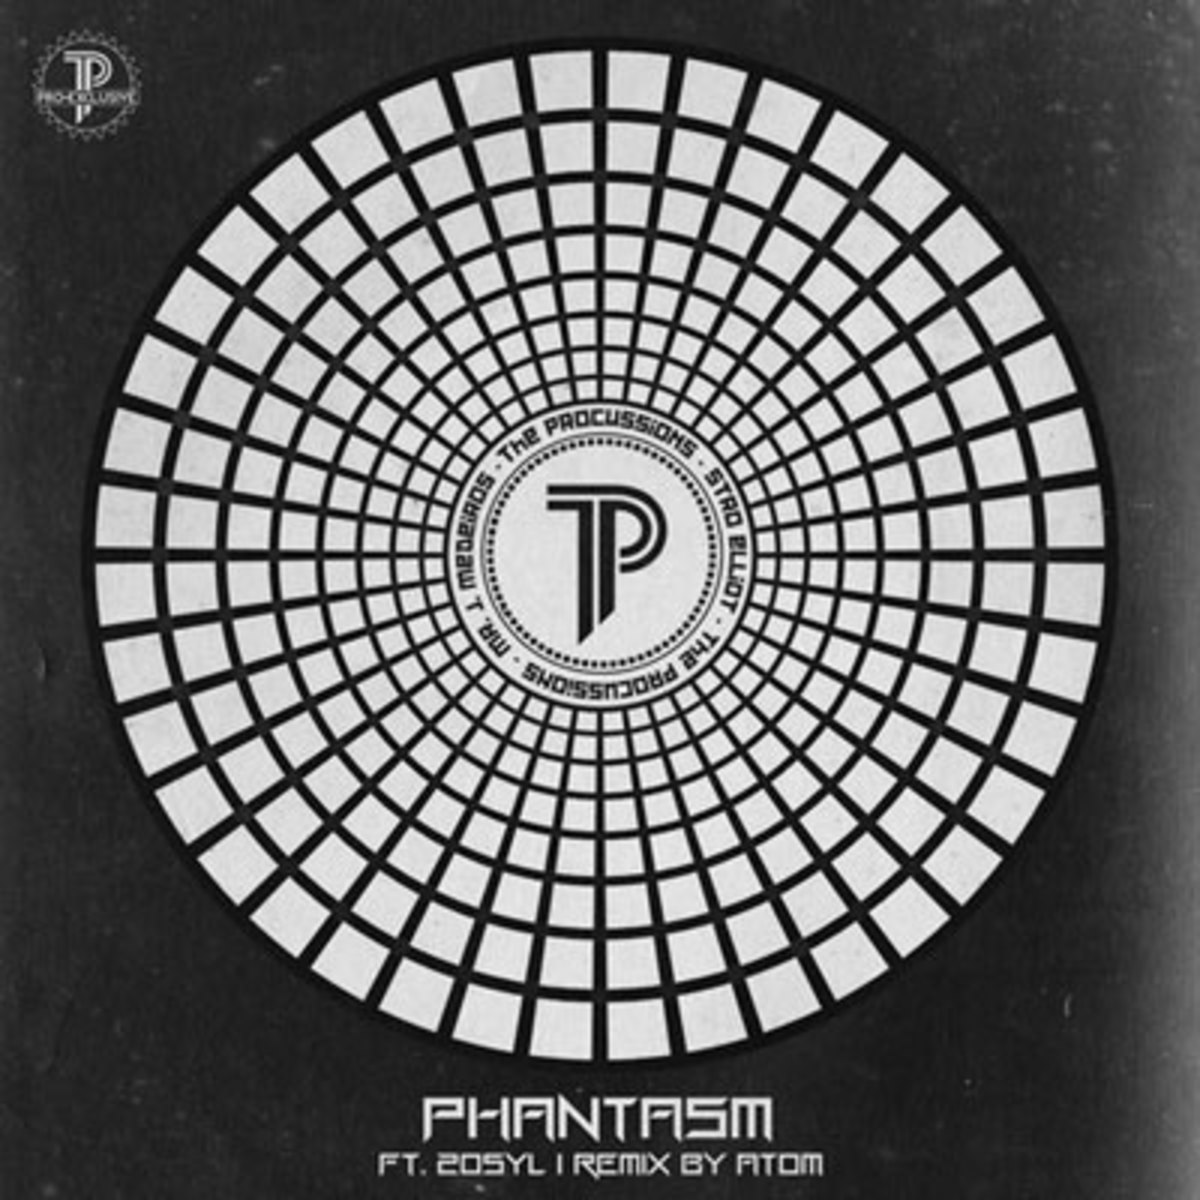 procussions-phantasmrmx.jpg